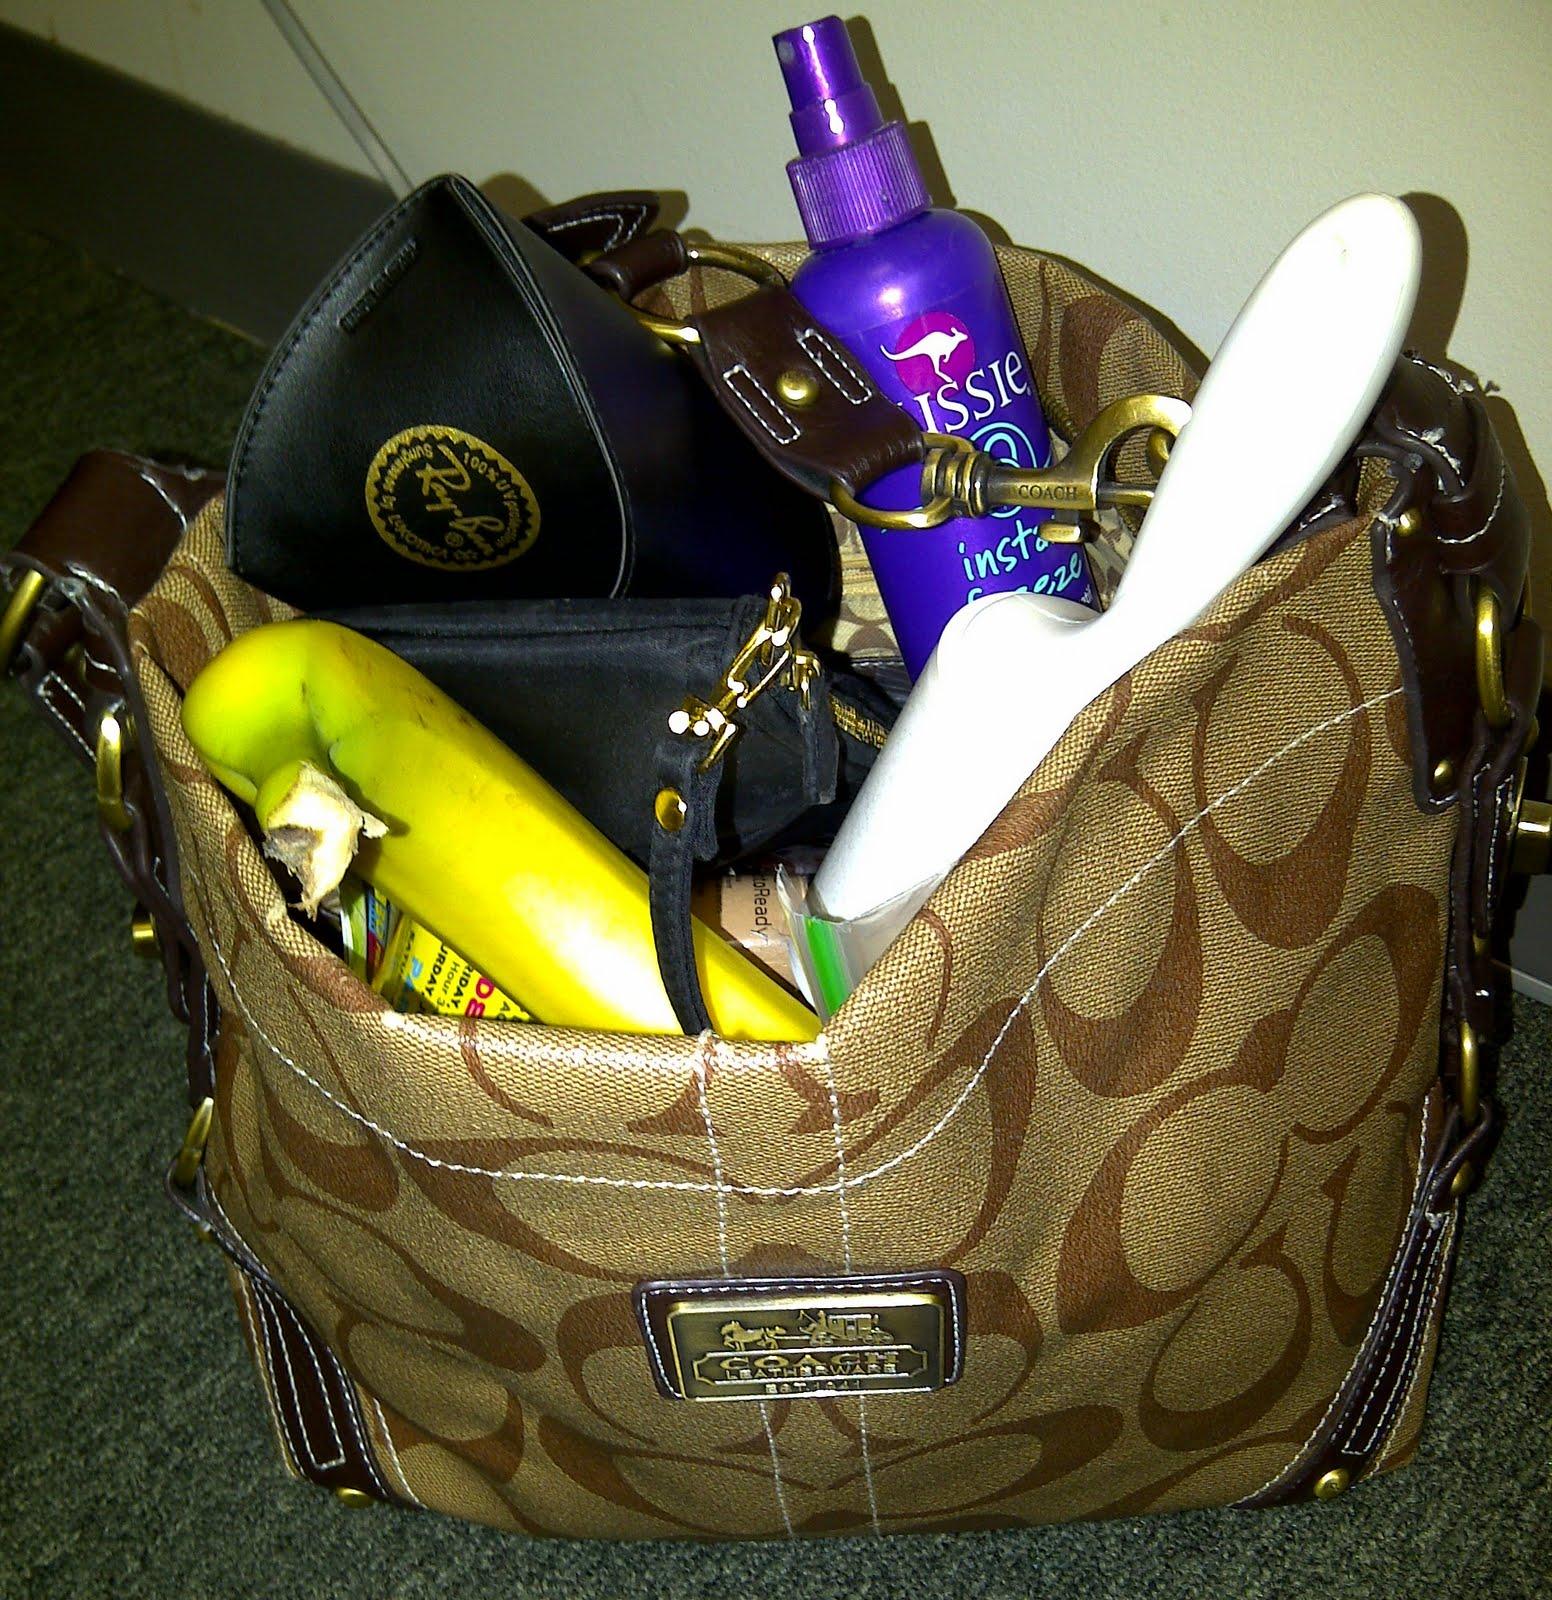 full purse